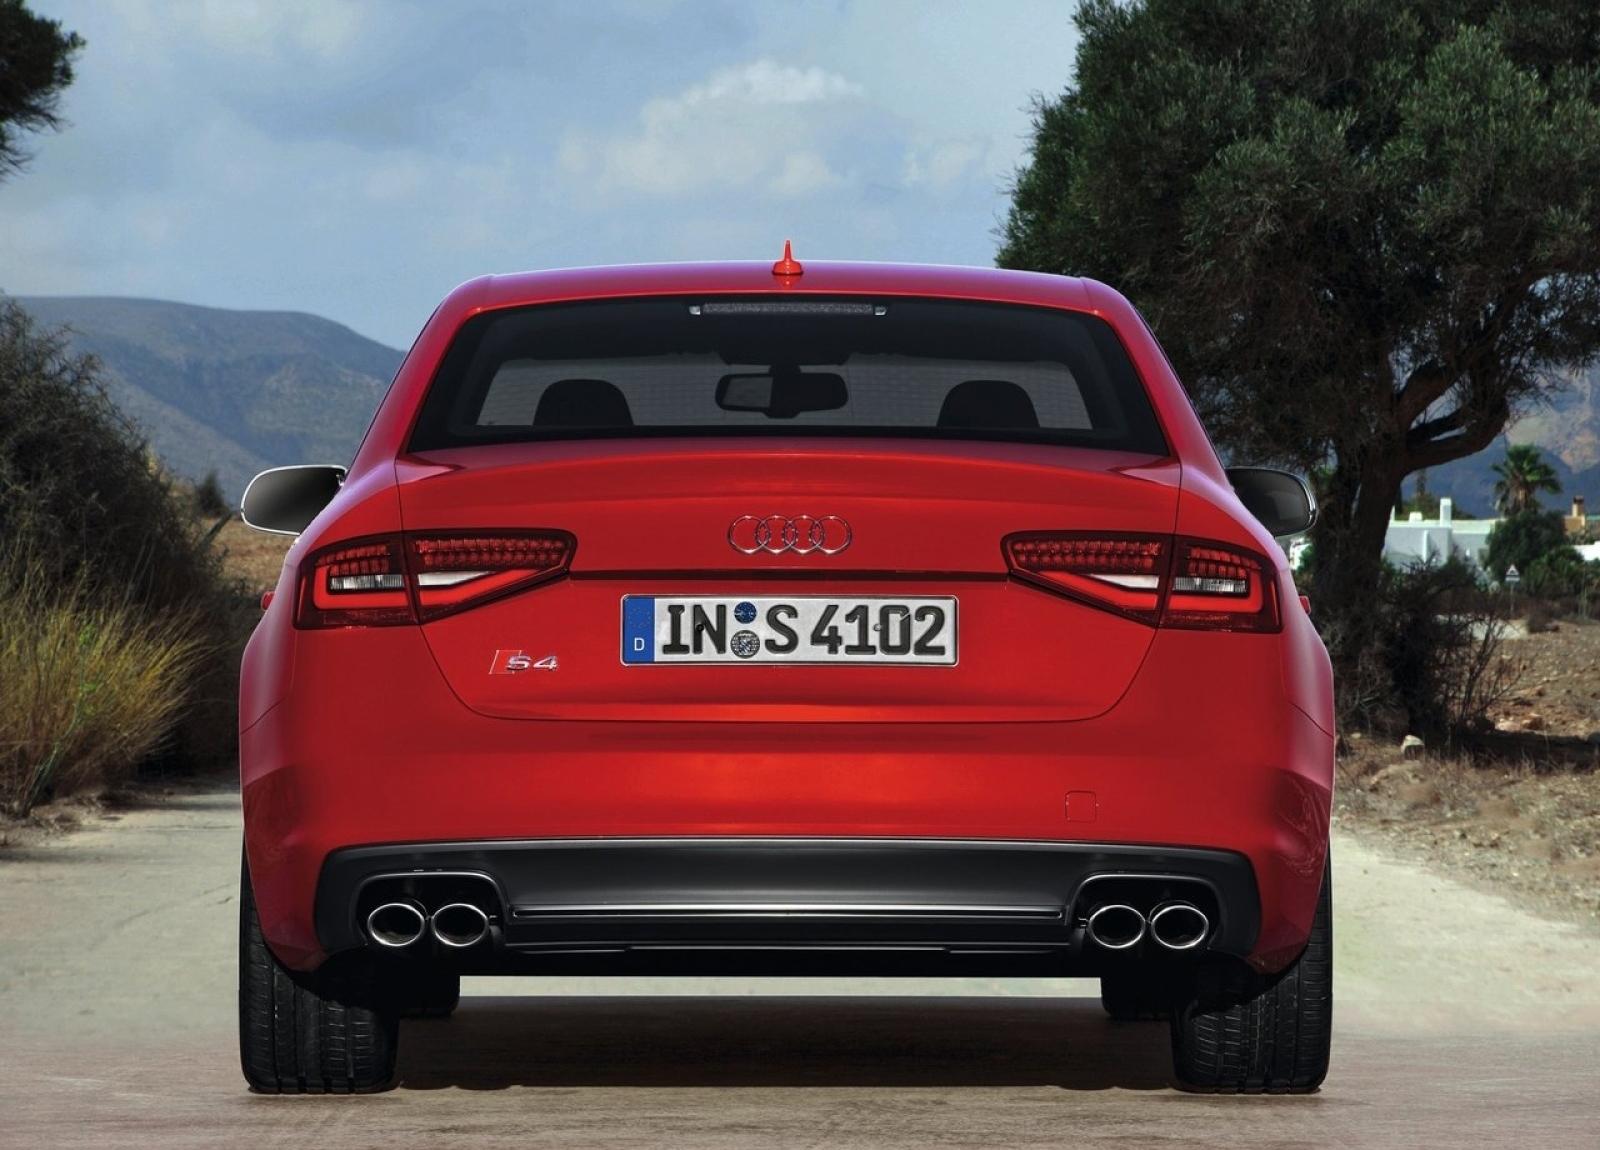 http://3.bp.blogspot.com/-7crVd_1_h1Q/TzZ7RtAOkQI/AAAAAAAAEfo/vjCiMf4R5pY/s1600/Audi-2013_S4_wallpaper-1600x1200_0014.jpg